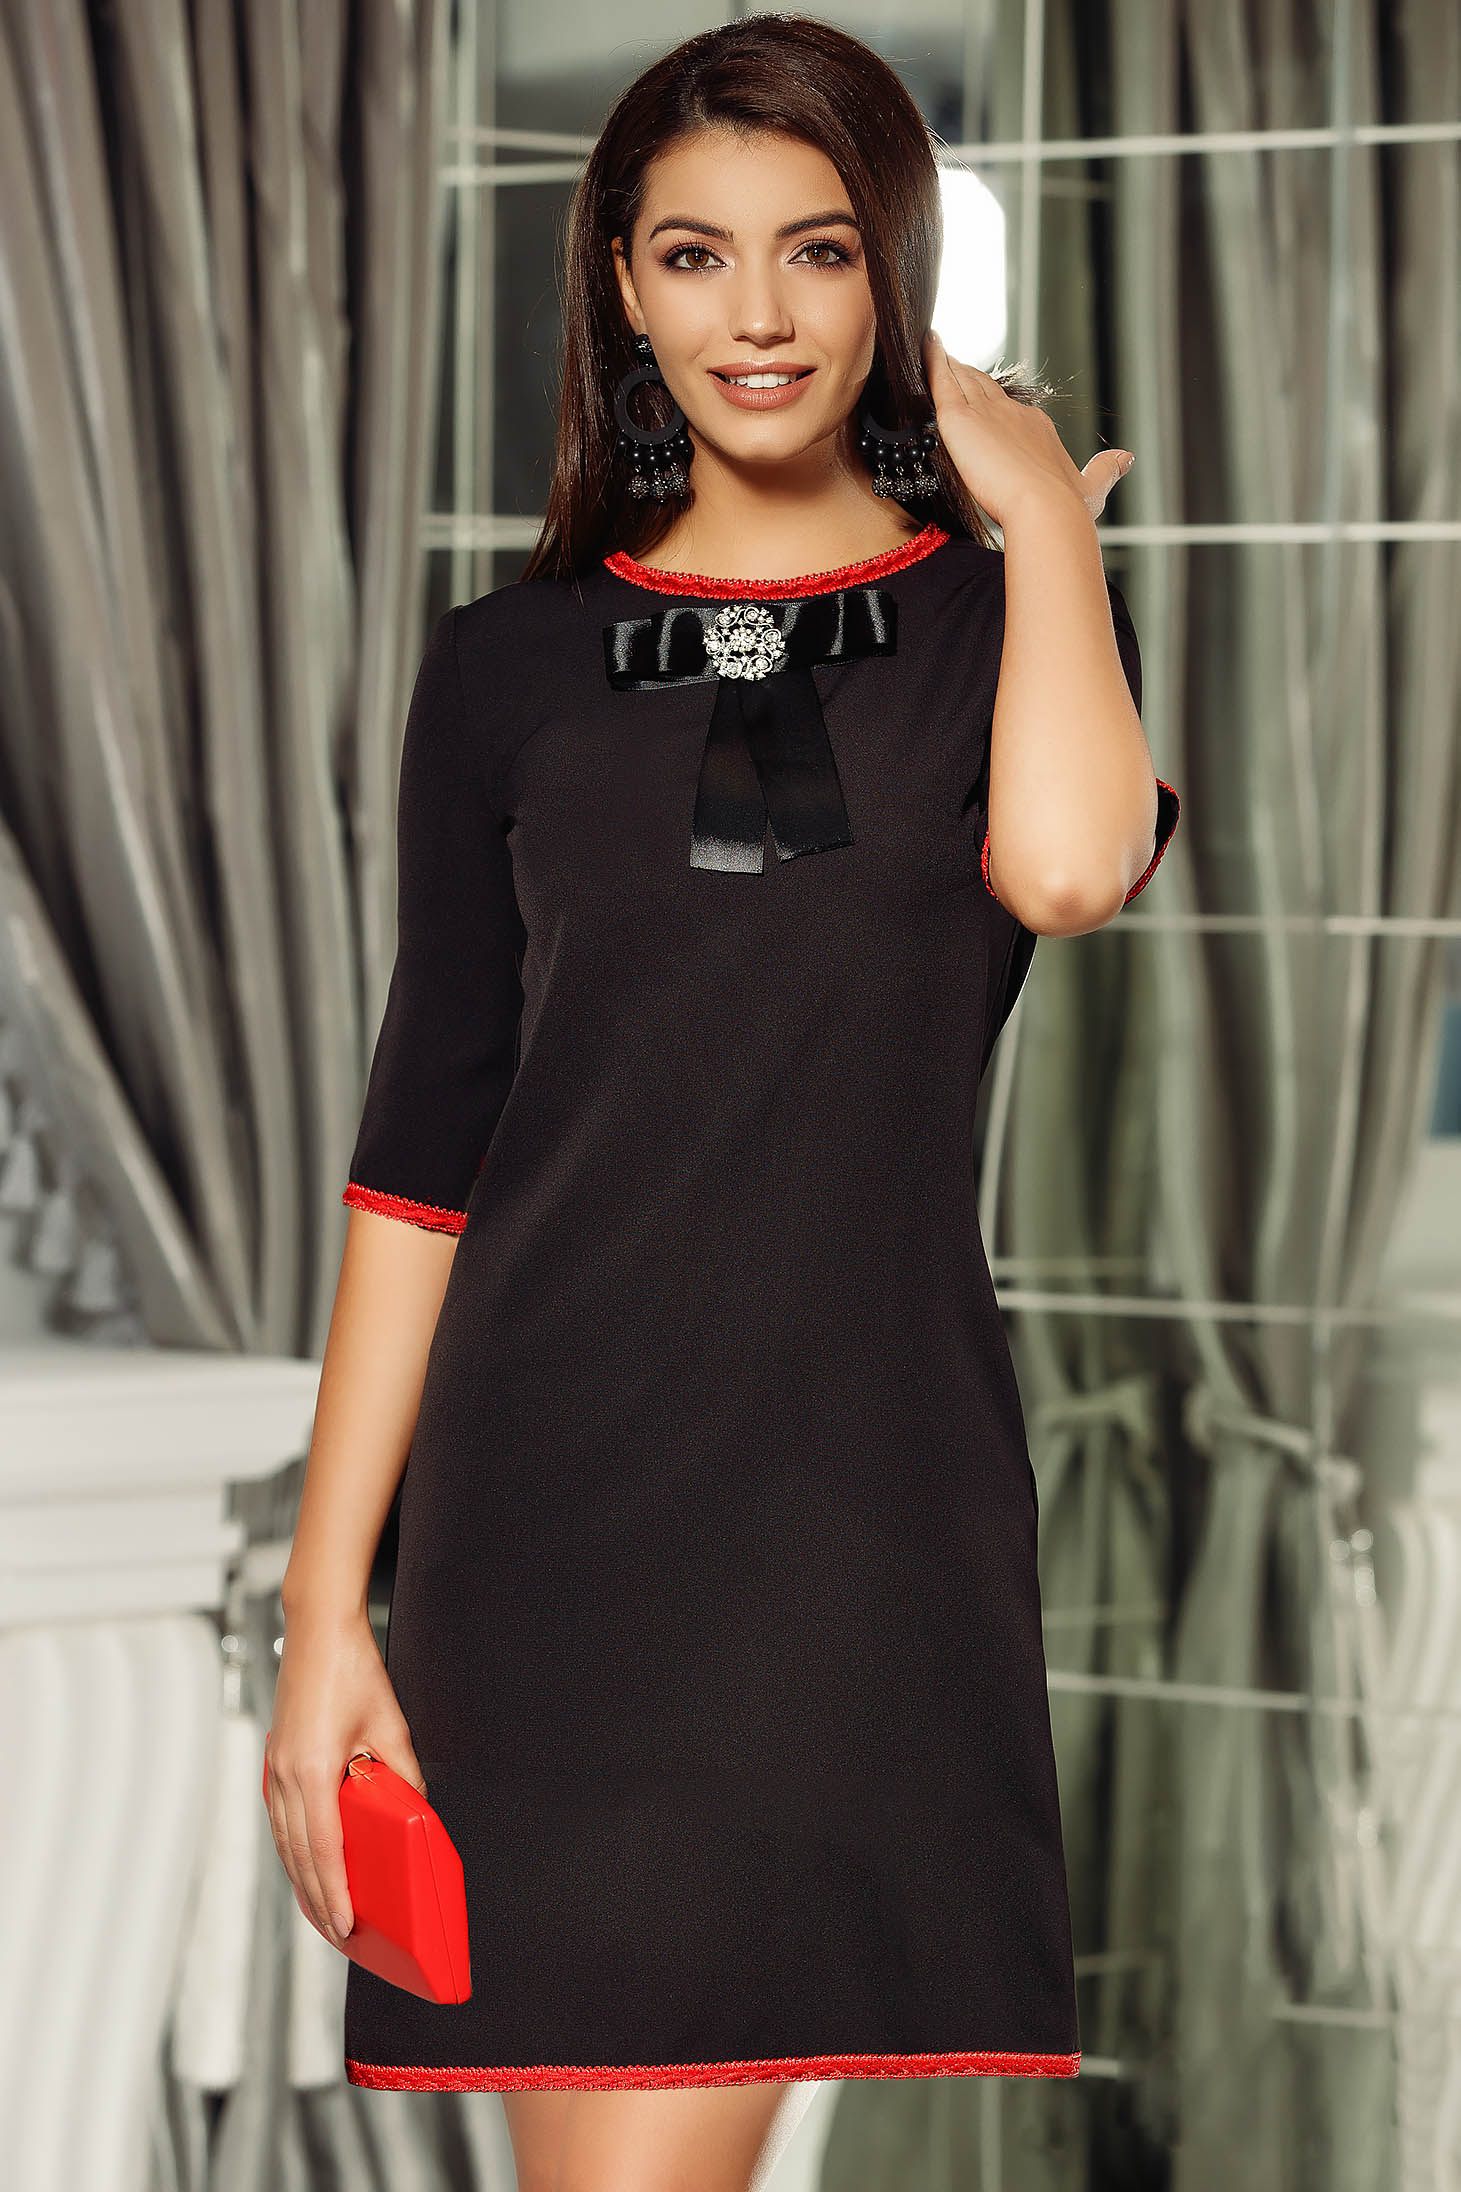 Fofy black elegant a-line dress bow accessory